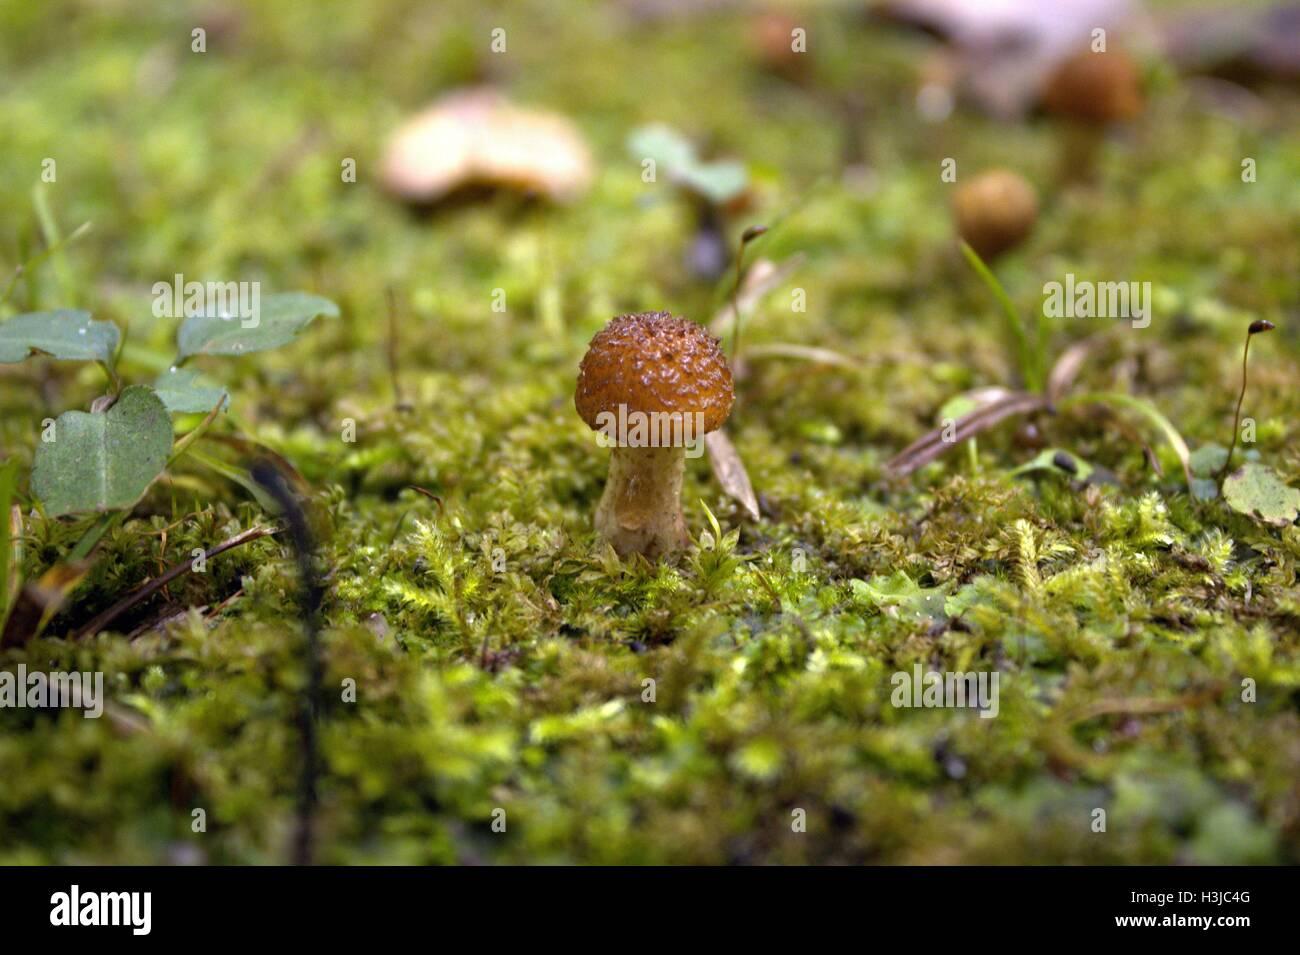 Armillaria Gallica; Winzige holprigen braunen Pilz in Moos Stockbild